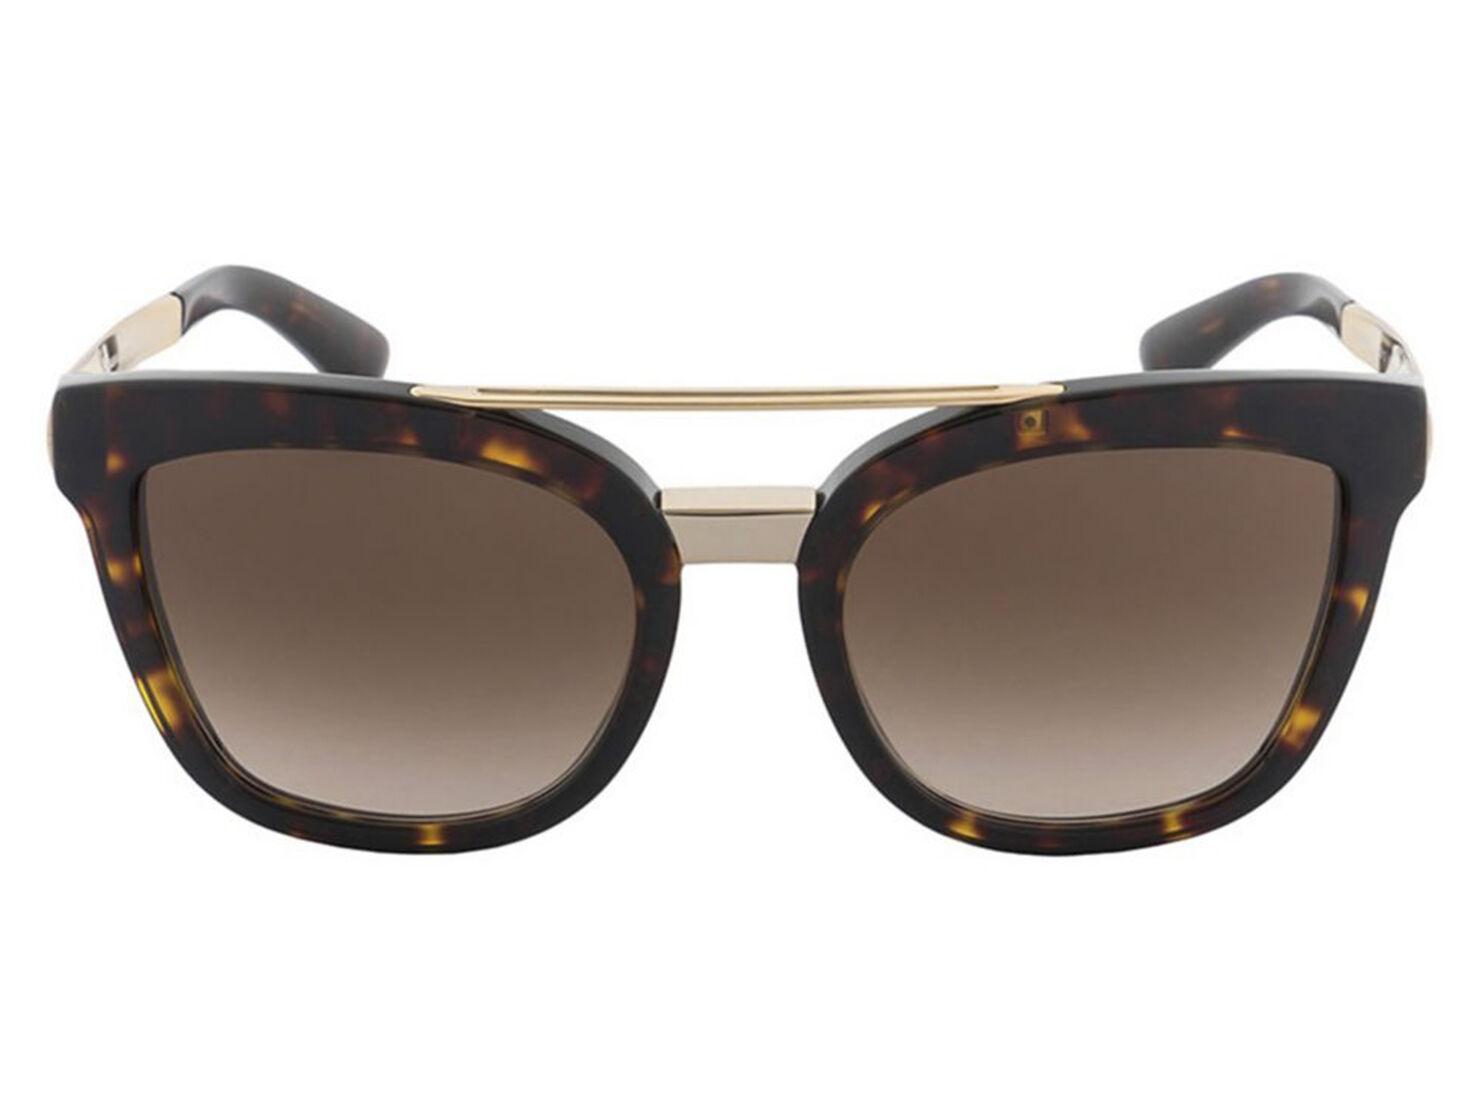 Lentes de Sol Dolce   Gabbana 4269 Mujer - Lentes de Sol  c630e4eeeb0a